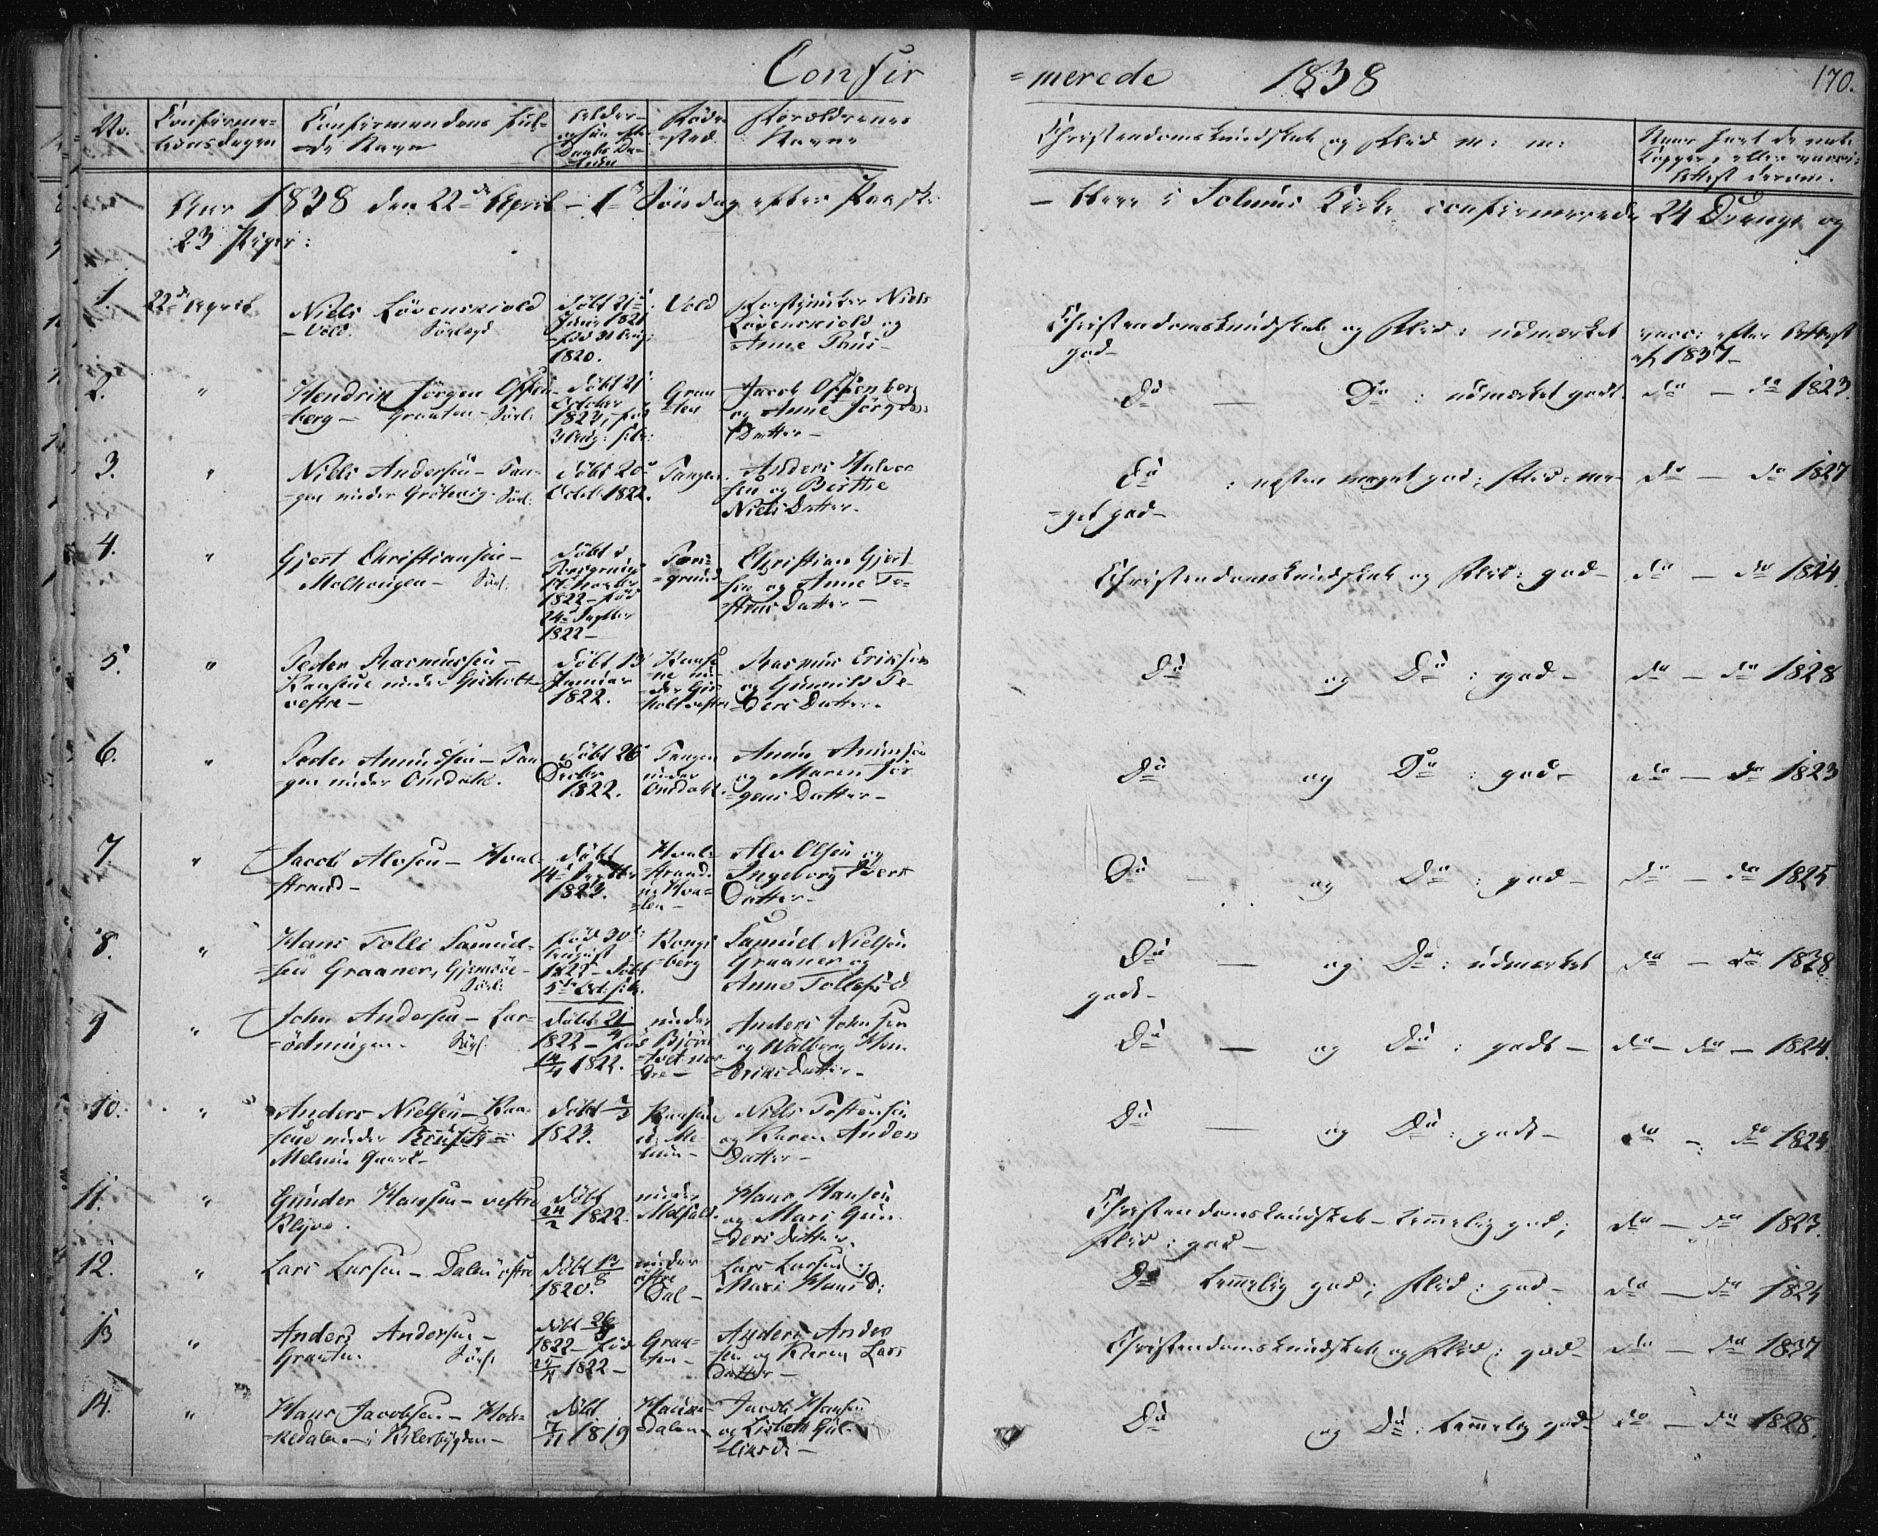 SAKO, Solum kirkebøker, F/Fa/L0005: Ministerialbok nr. I 5, 1833-1843, s. 170